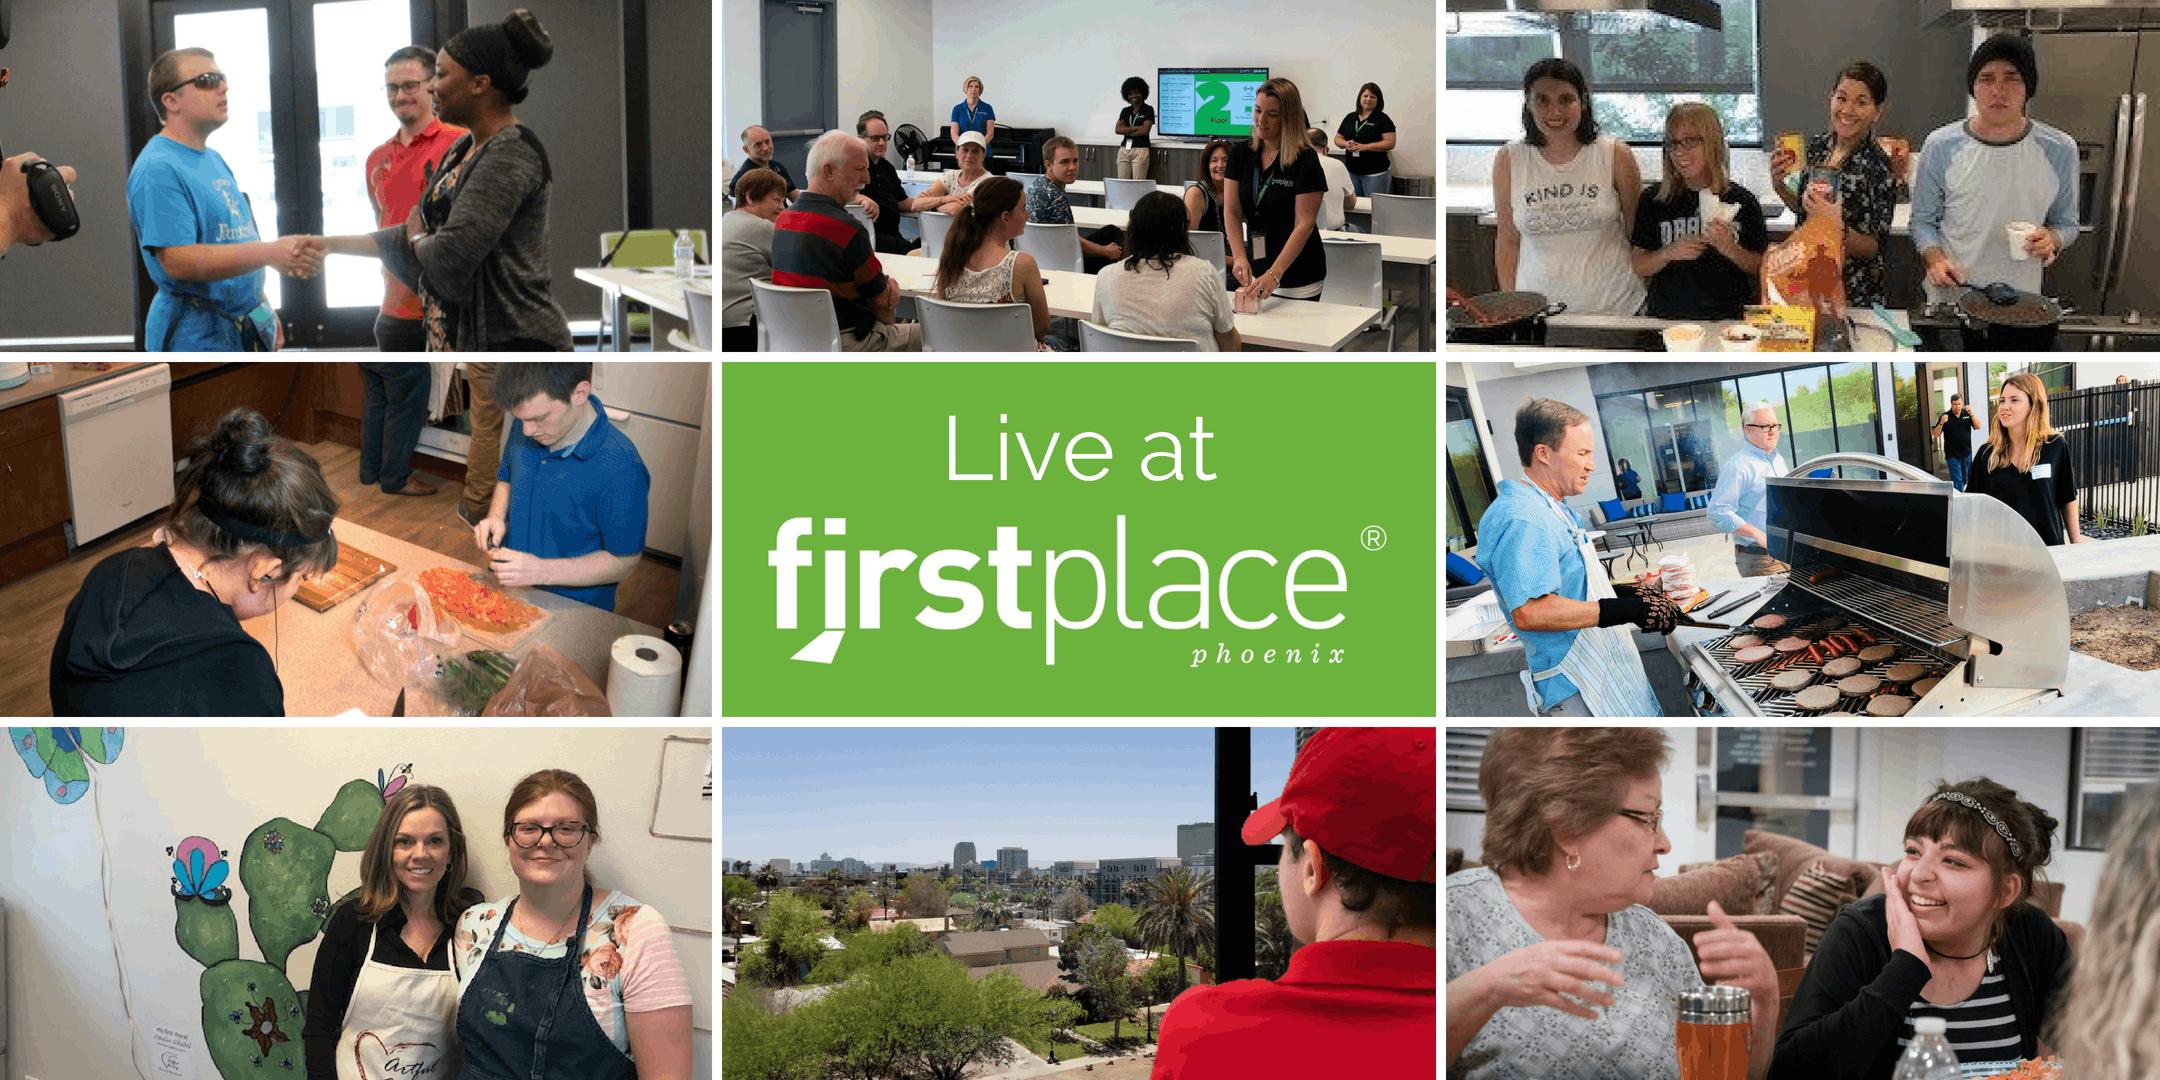 Explore First Place–Phoenix - August 30